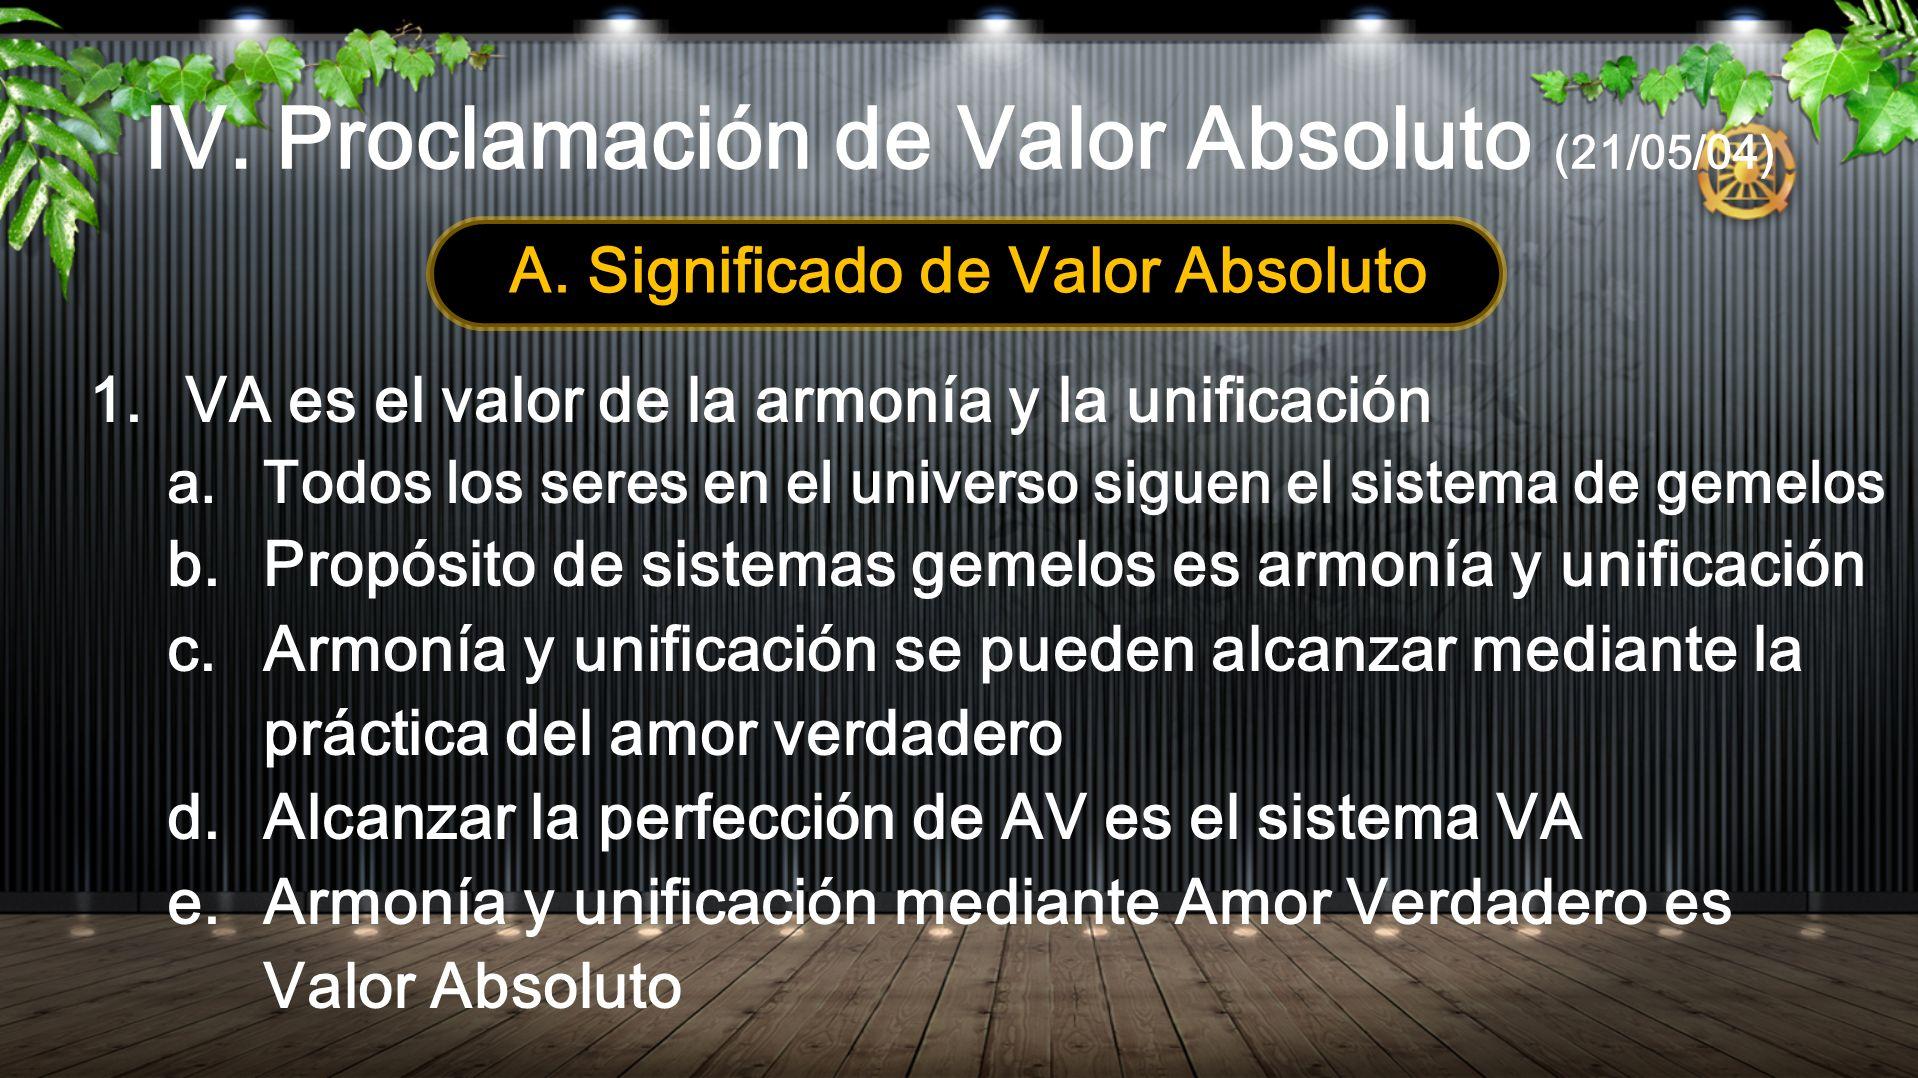 IV. Proclamación de Valor Absoluto (21/05/04)